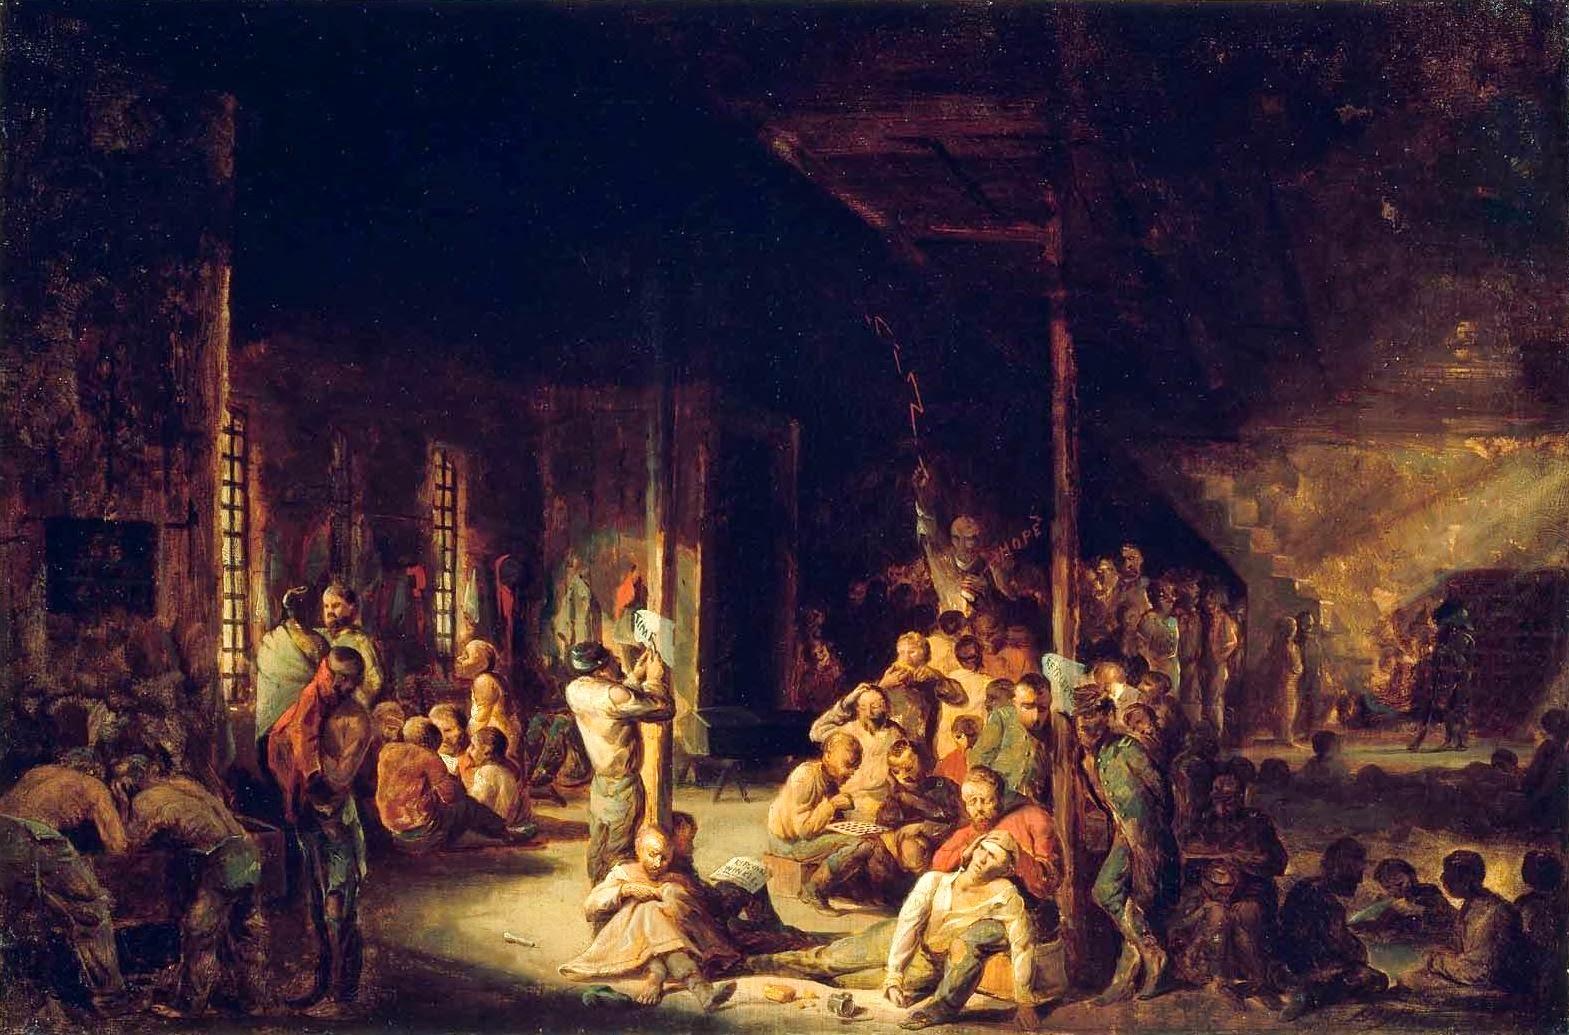 The Civil War 150th Blog Escape From Libby Prison